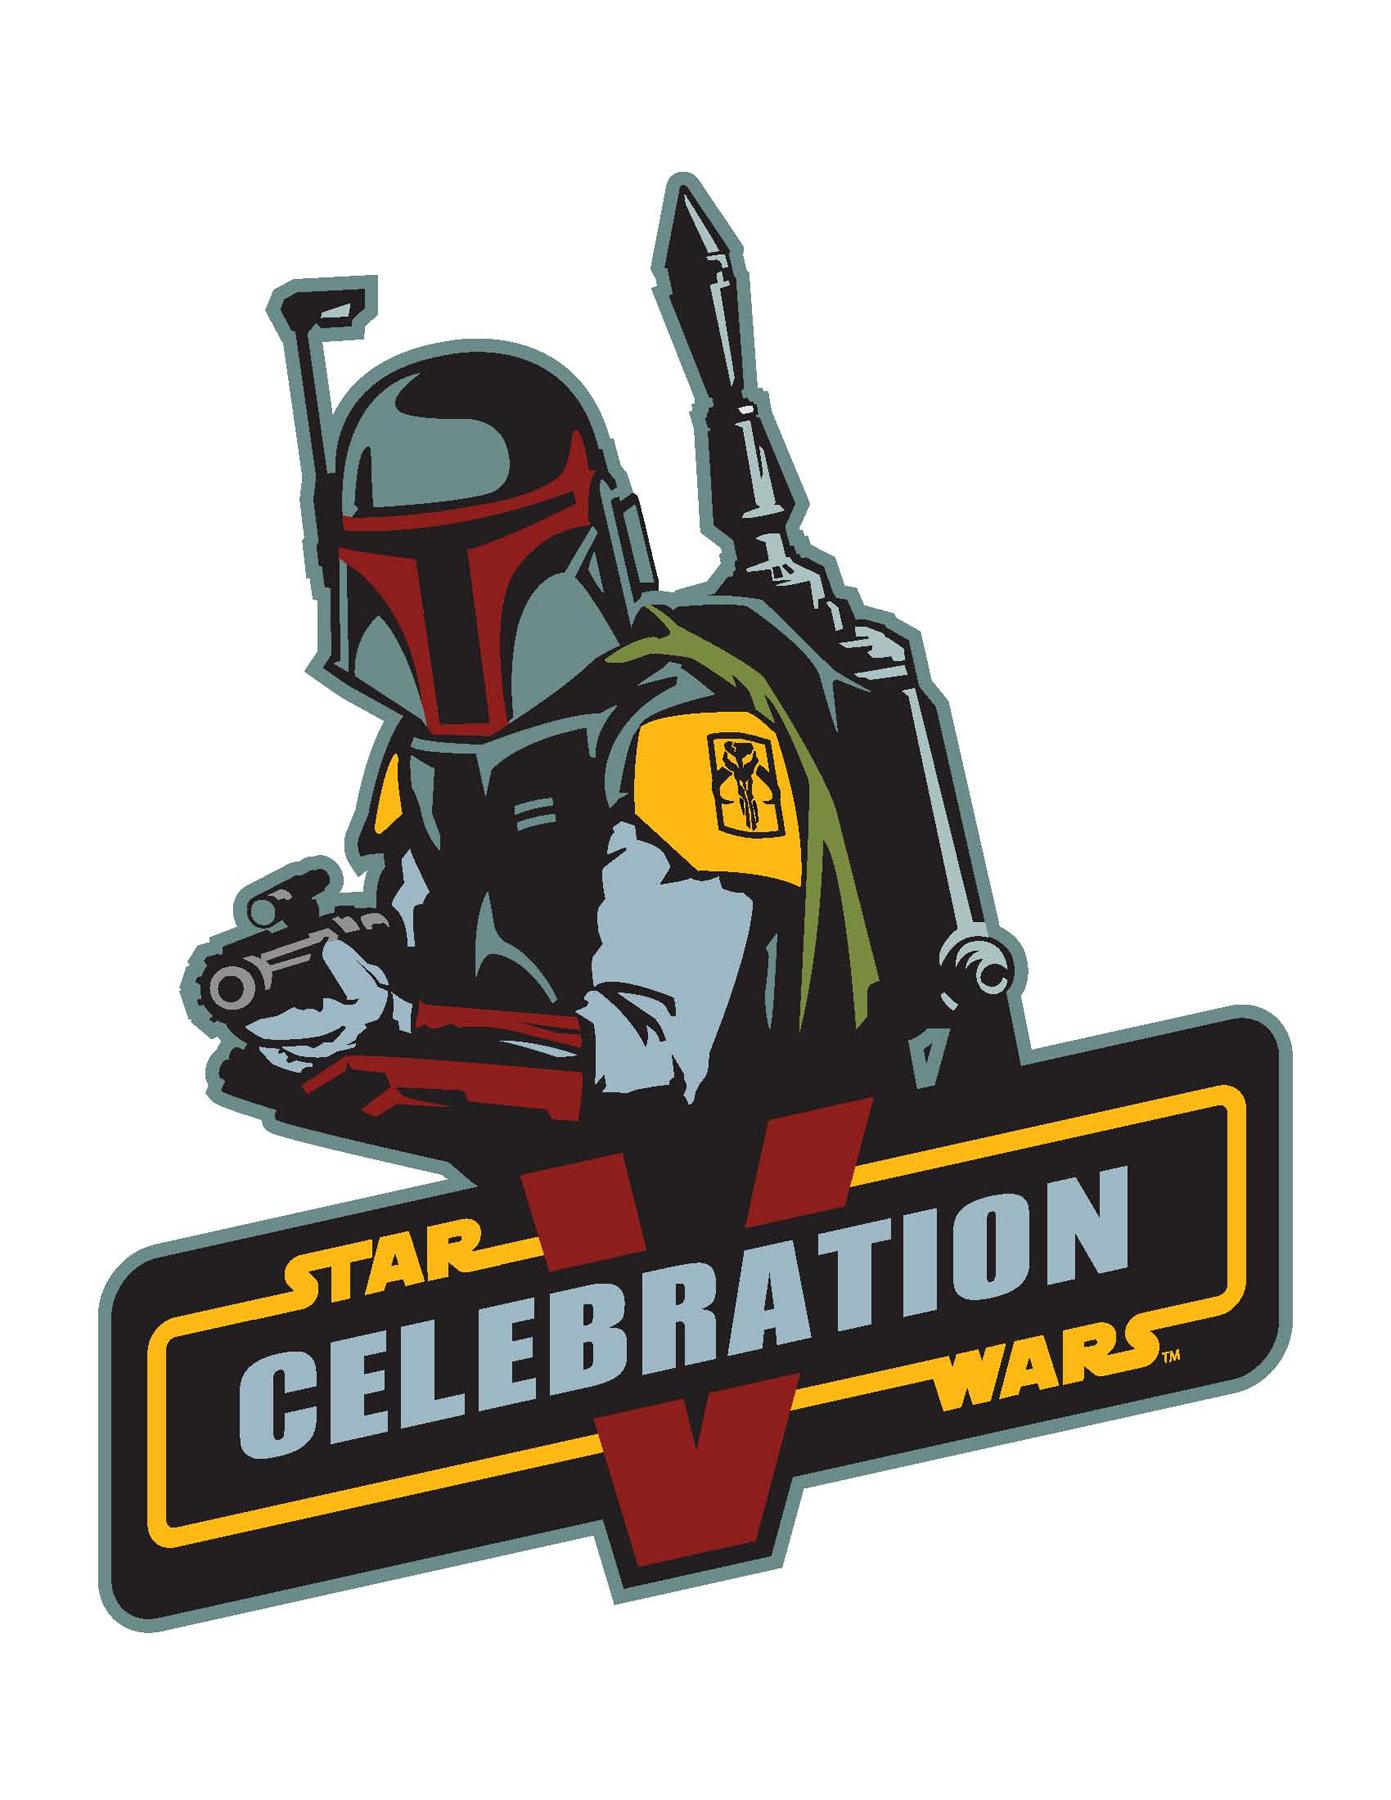 lego star wars clipart - photo #50